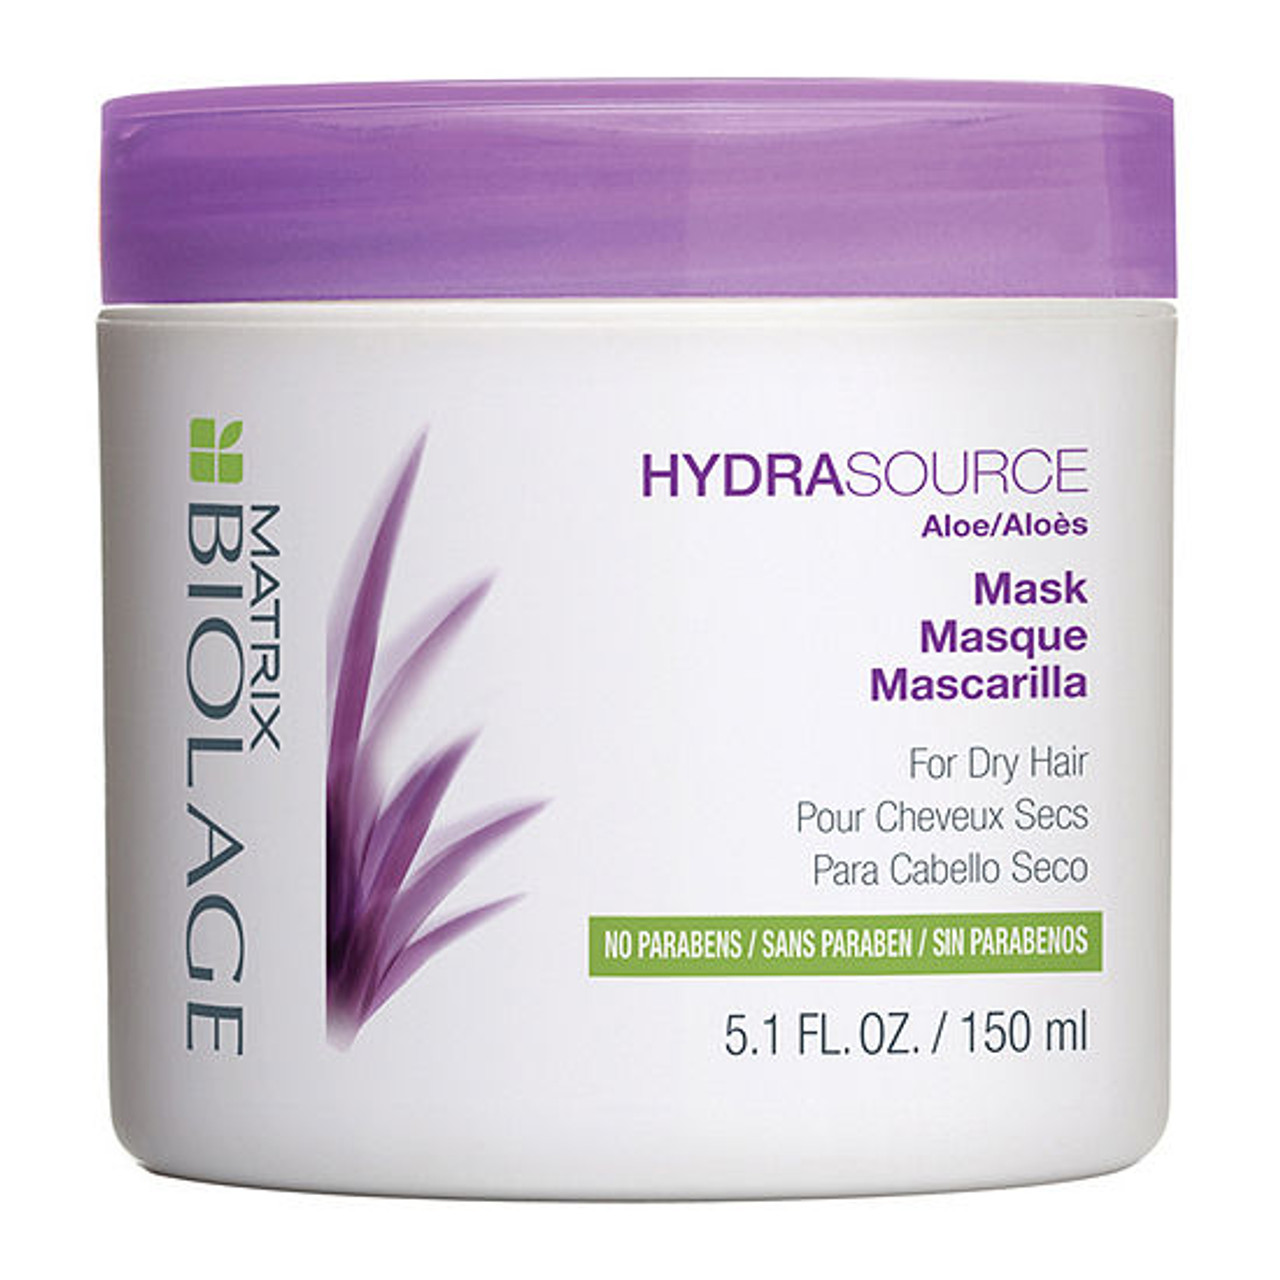 Biolage Hydrasource Mask 5.1 oz